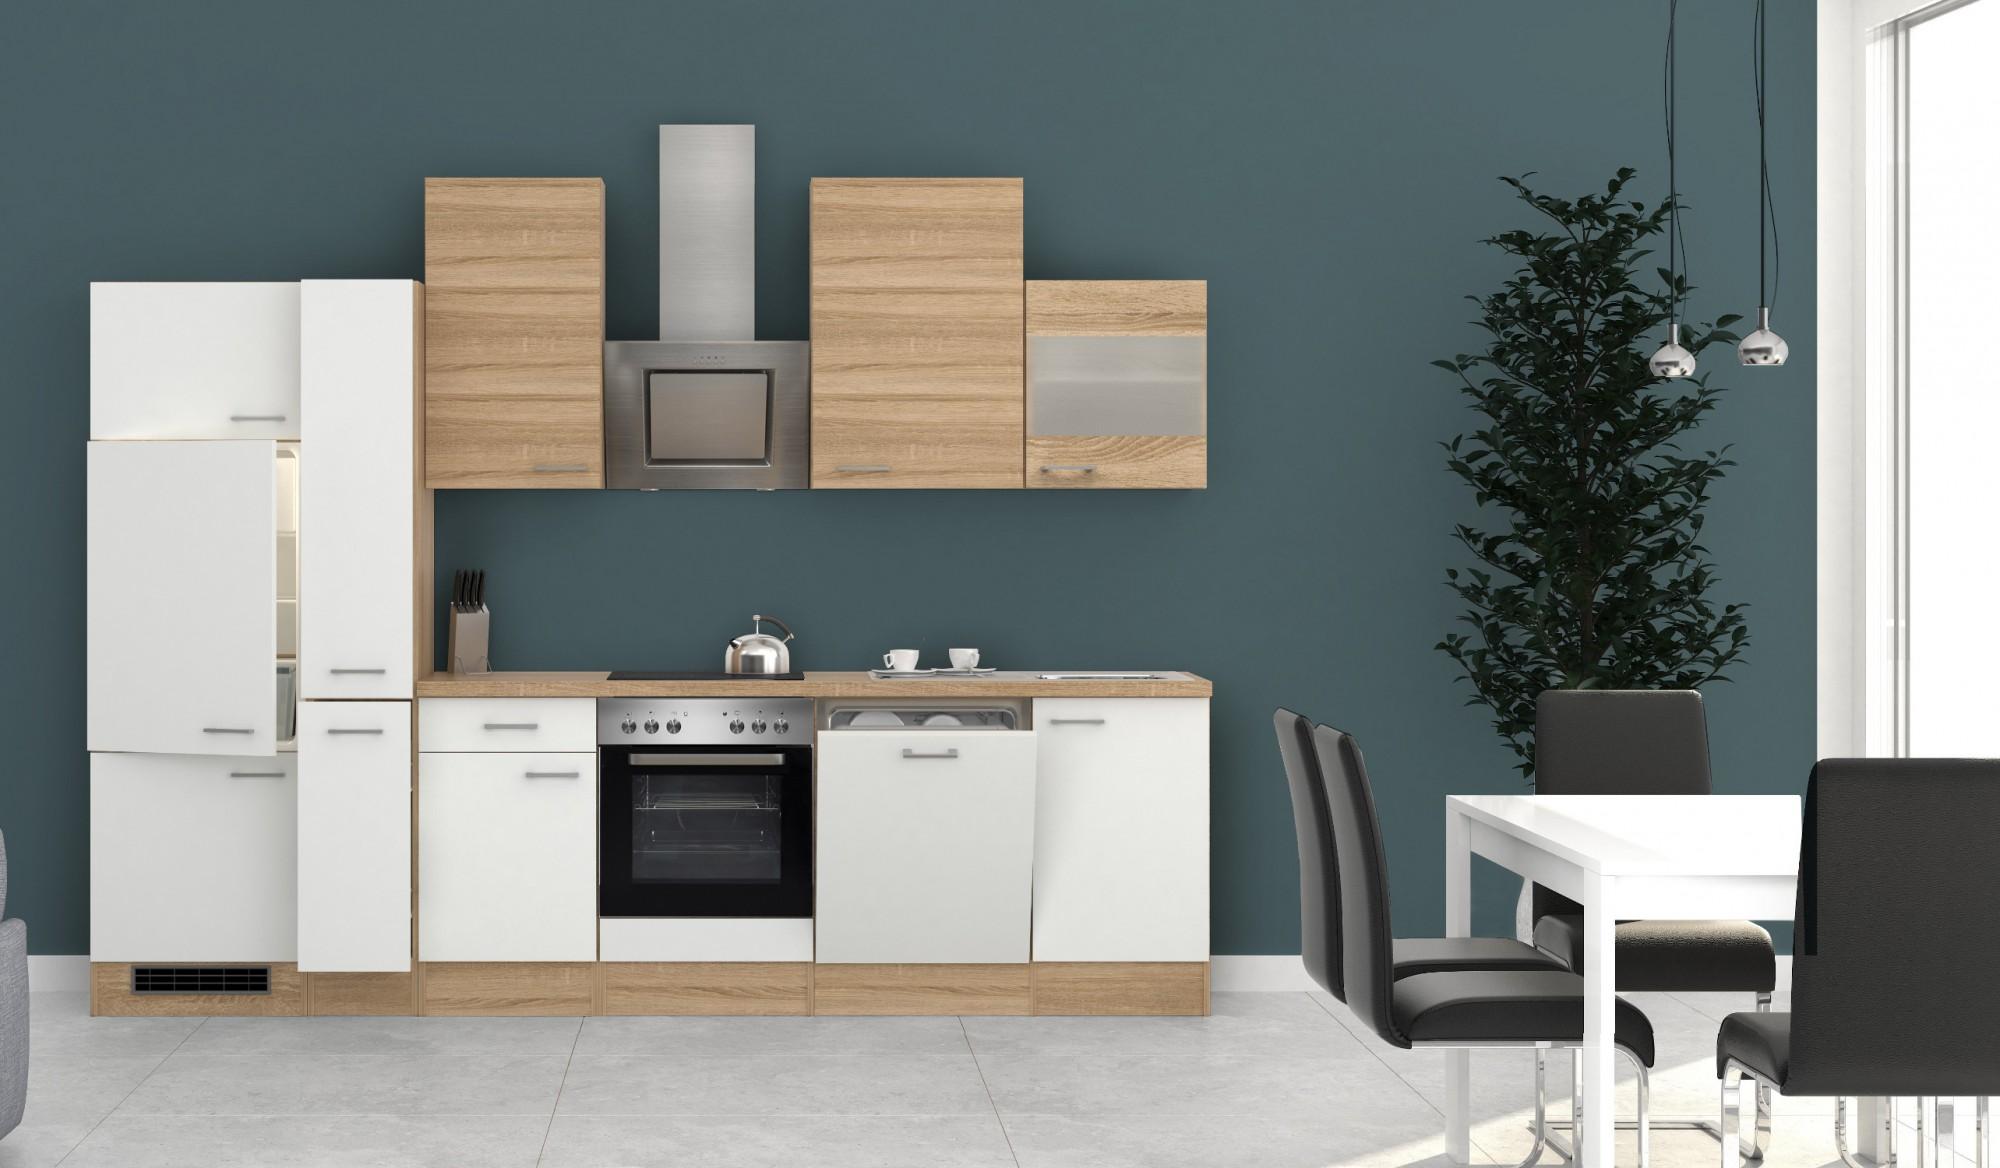 neu k chenzeile rom k chenblock 310cm wei sonoma k che mit e ger te ebay. Black Bedroom Furniture Sets. Home Design Ideas